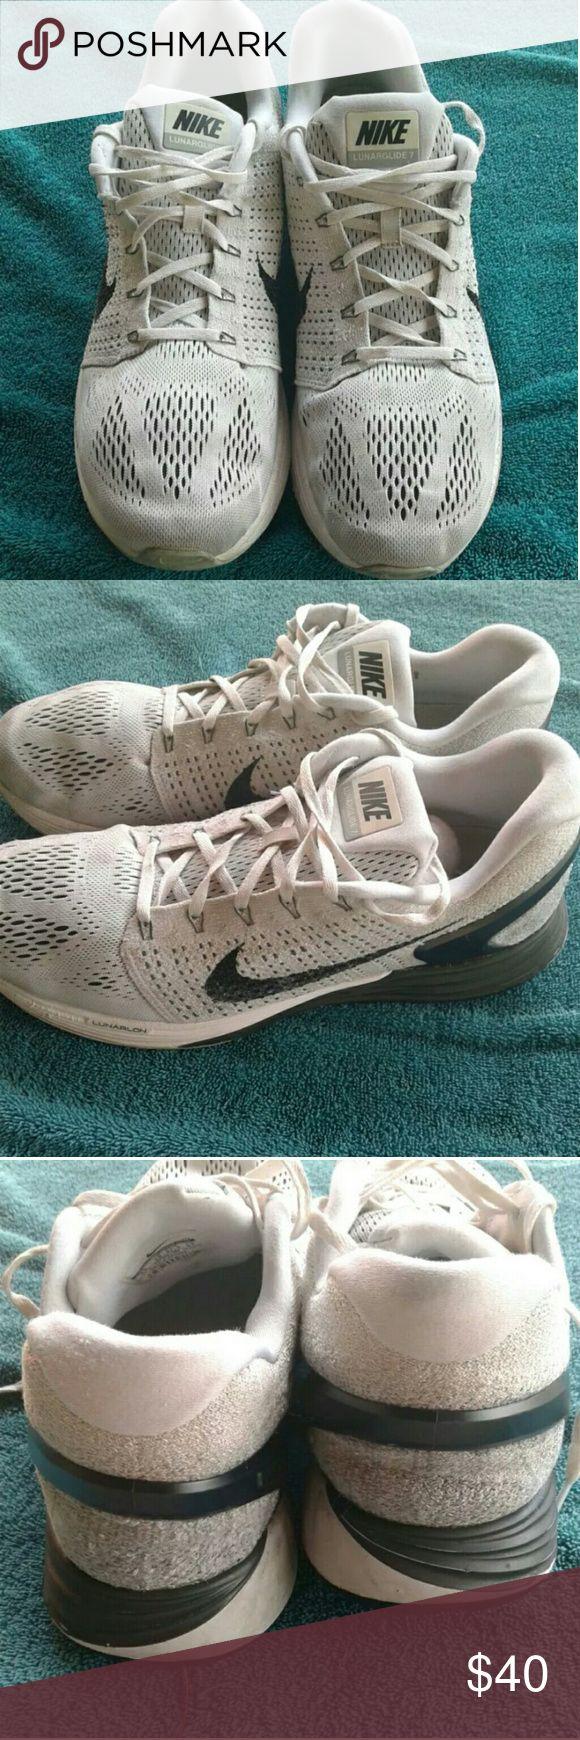 Nike Lunarglide 7 Men Shoes Size 13 Nike Lunarglide 7 Men Shoes Size 13 Nike Shoes Athletic Shoes